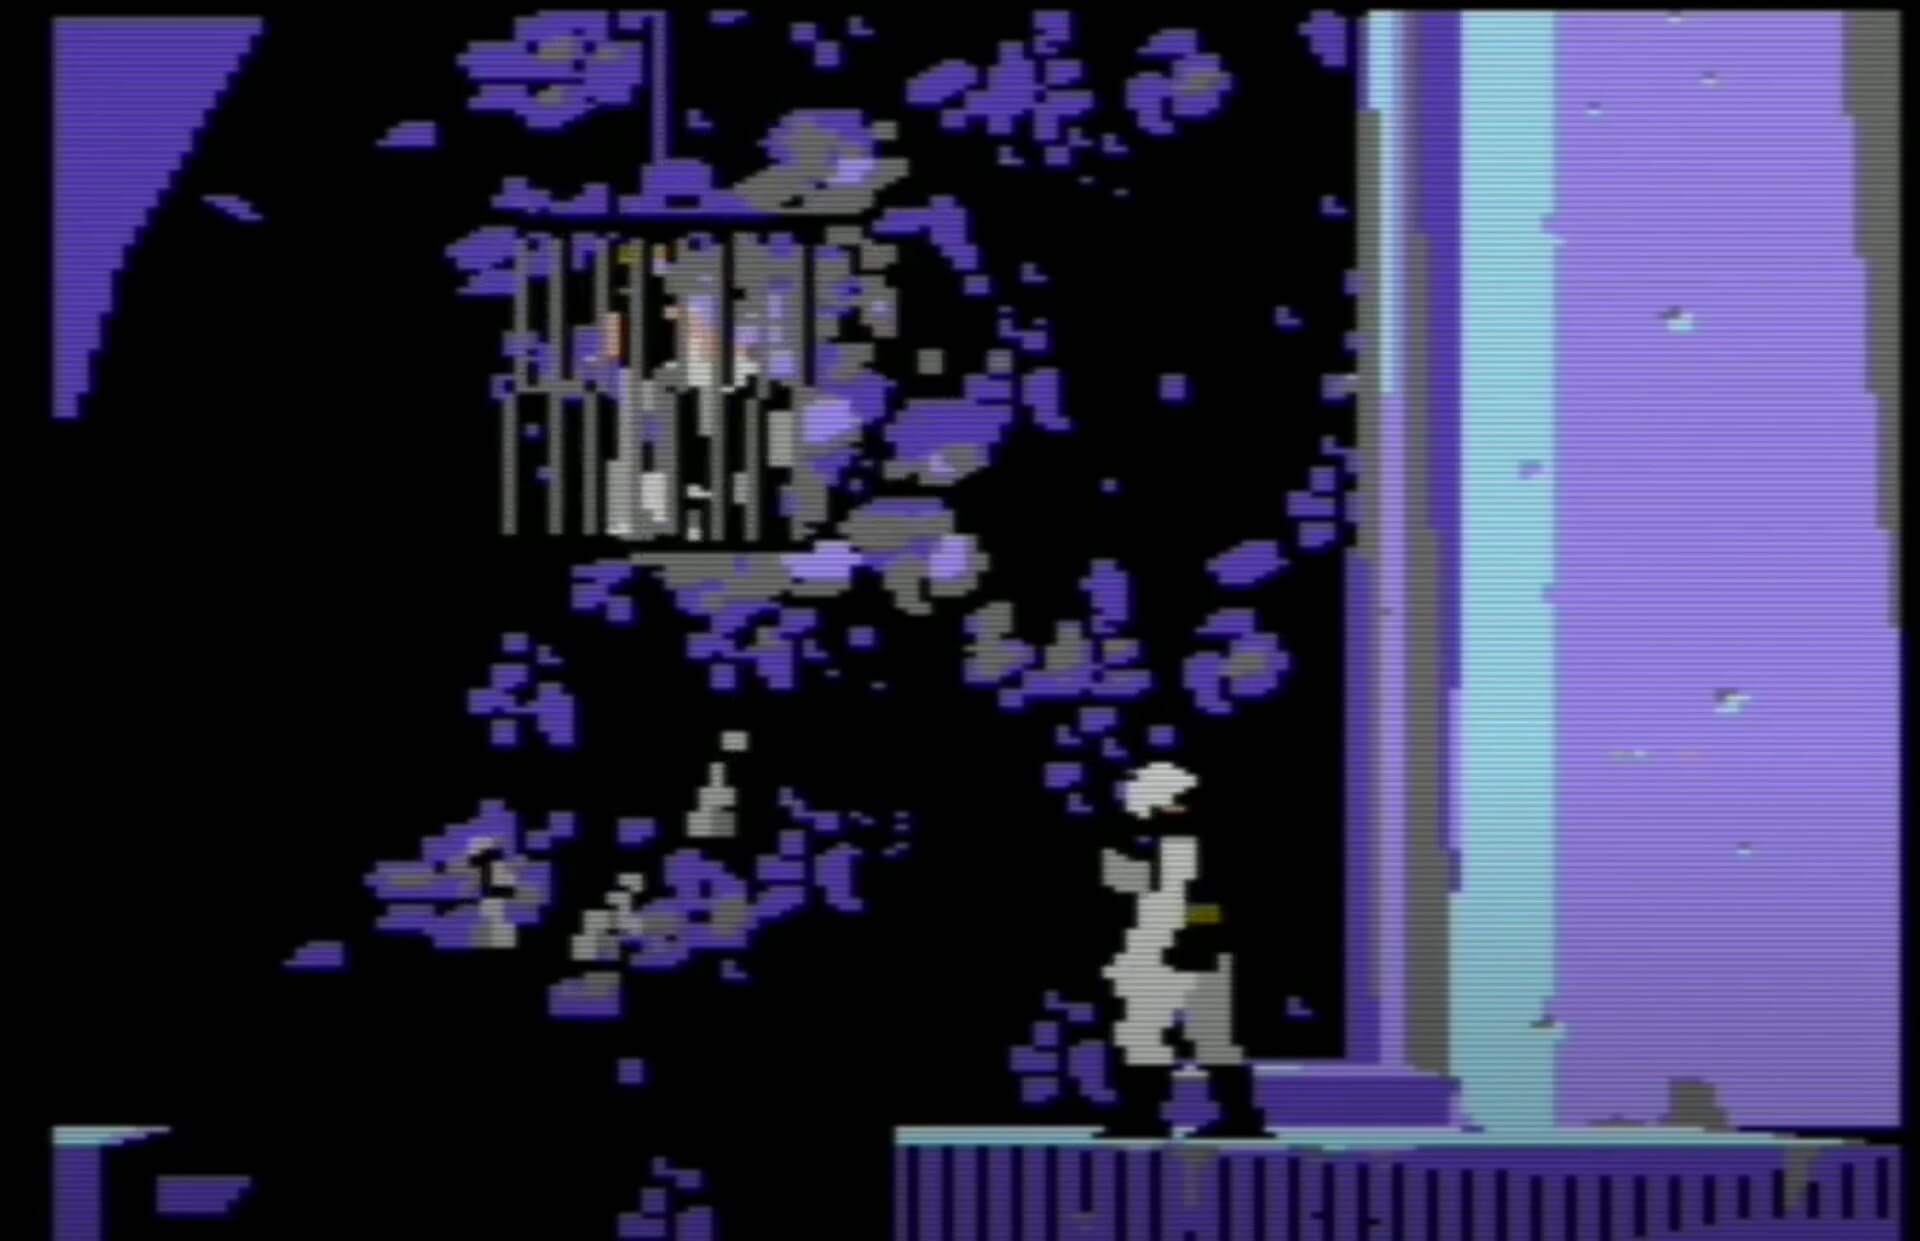 Amiga-Klassiker: Another World für den C64